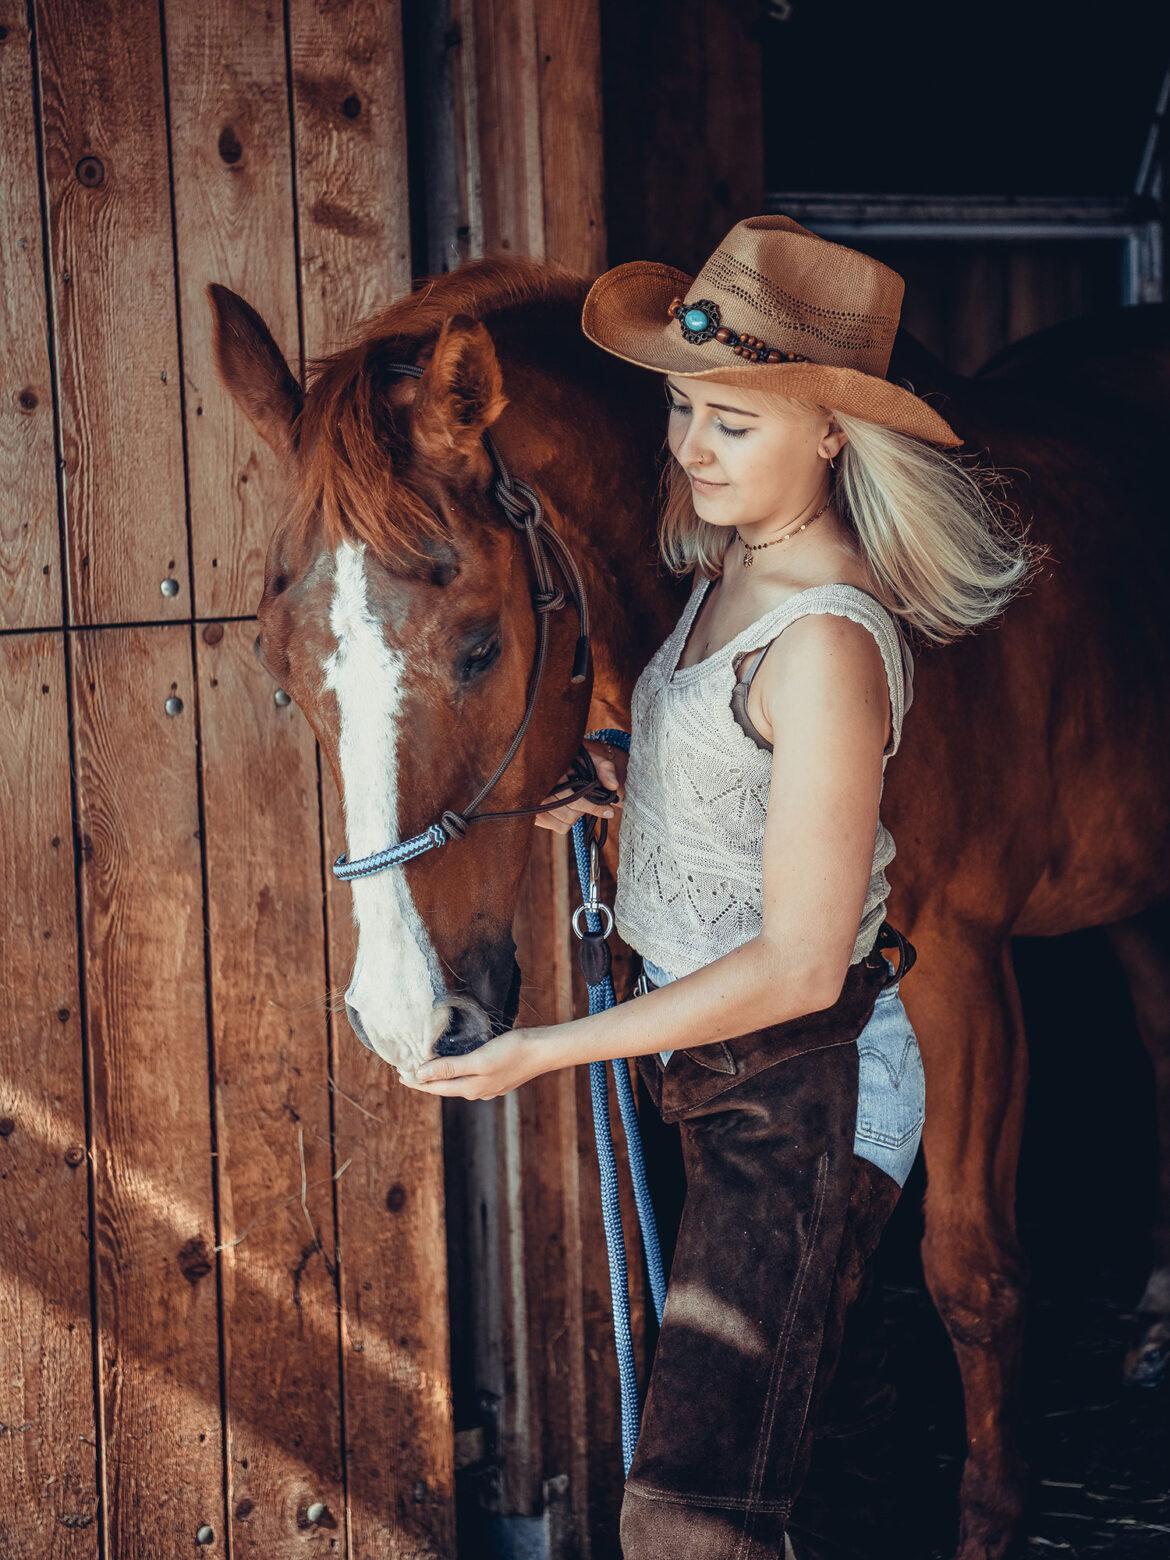 Pferdefluesterin_2